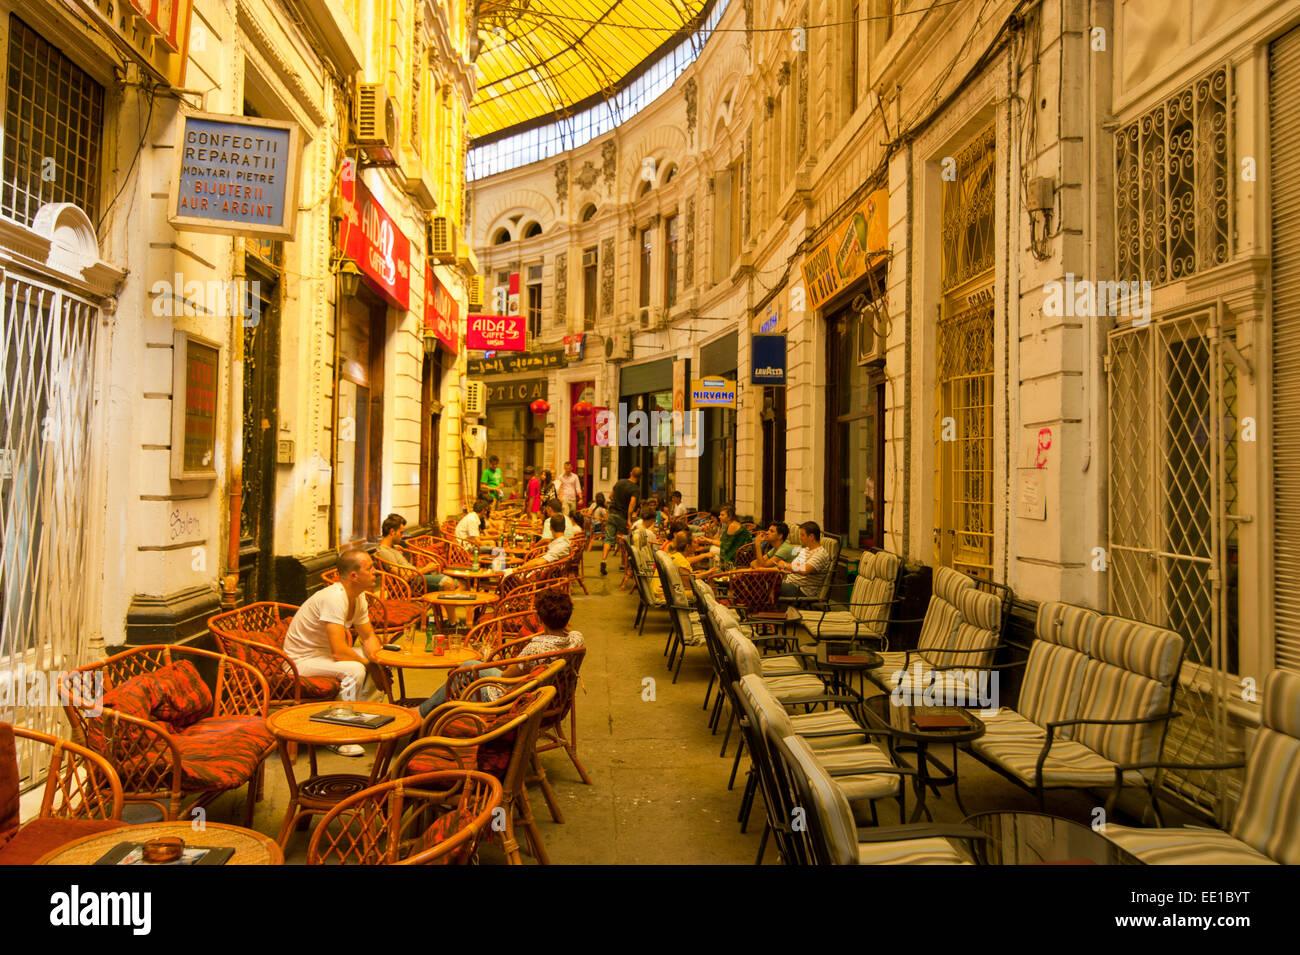 Pasajul Macca-Vilacrosse arcade, Bucharest, Romania - Stock Image